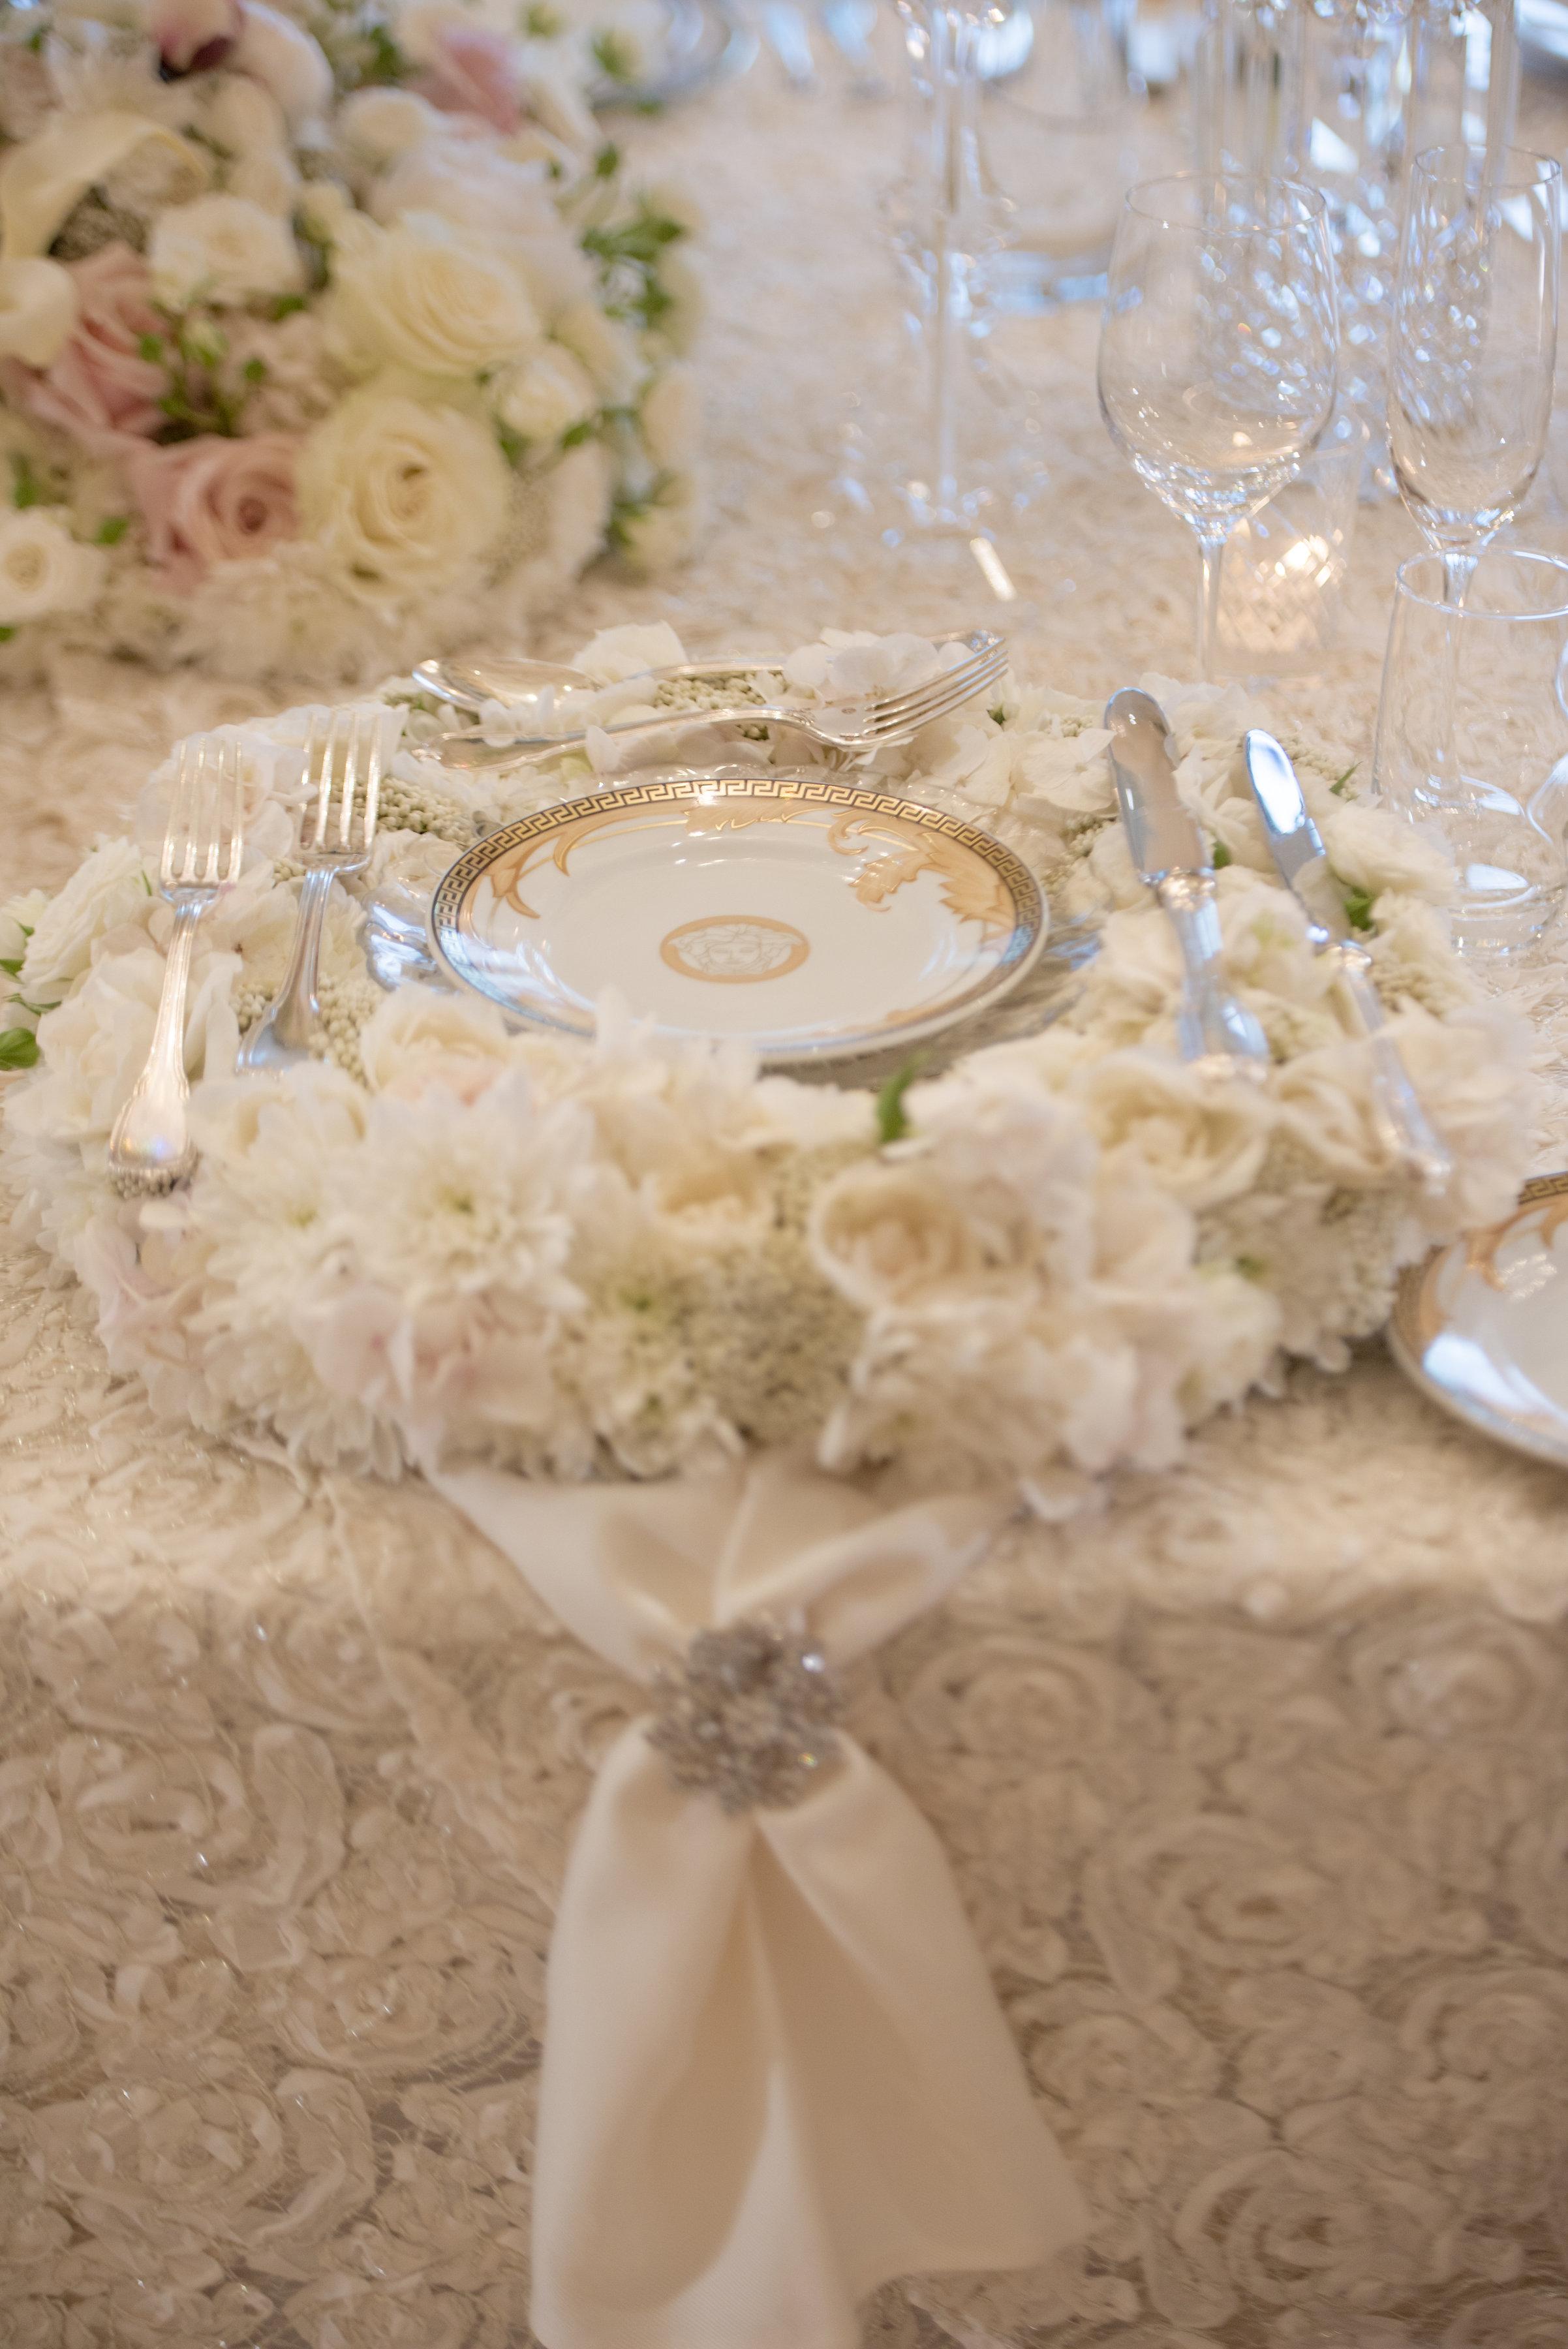 Hire_Ivory_rose_luxury_linen_sydney_wedding_decor_event_Versace_Decor_charger_plate_napkin_ring.jpg